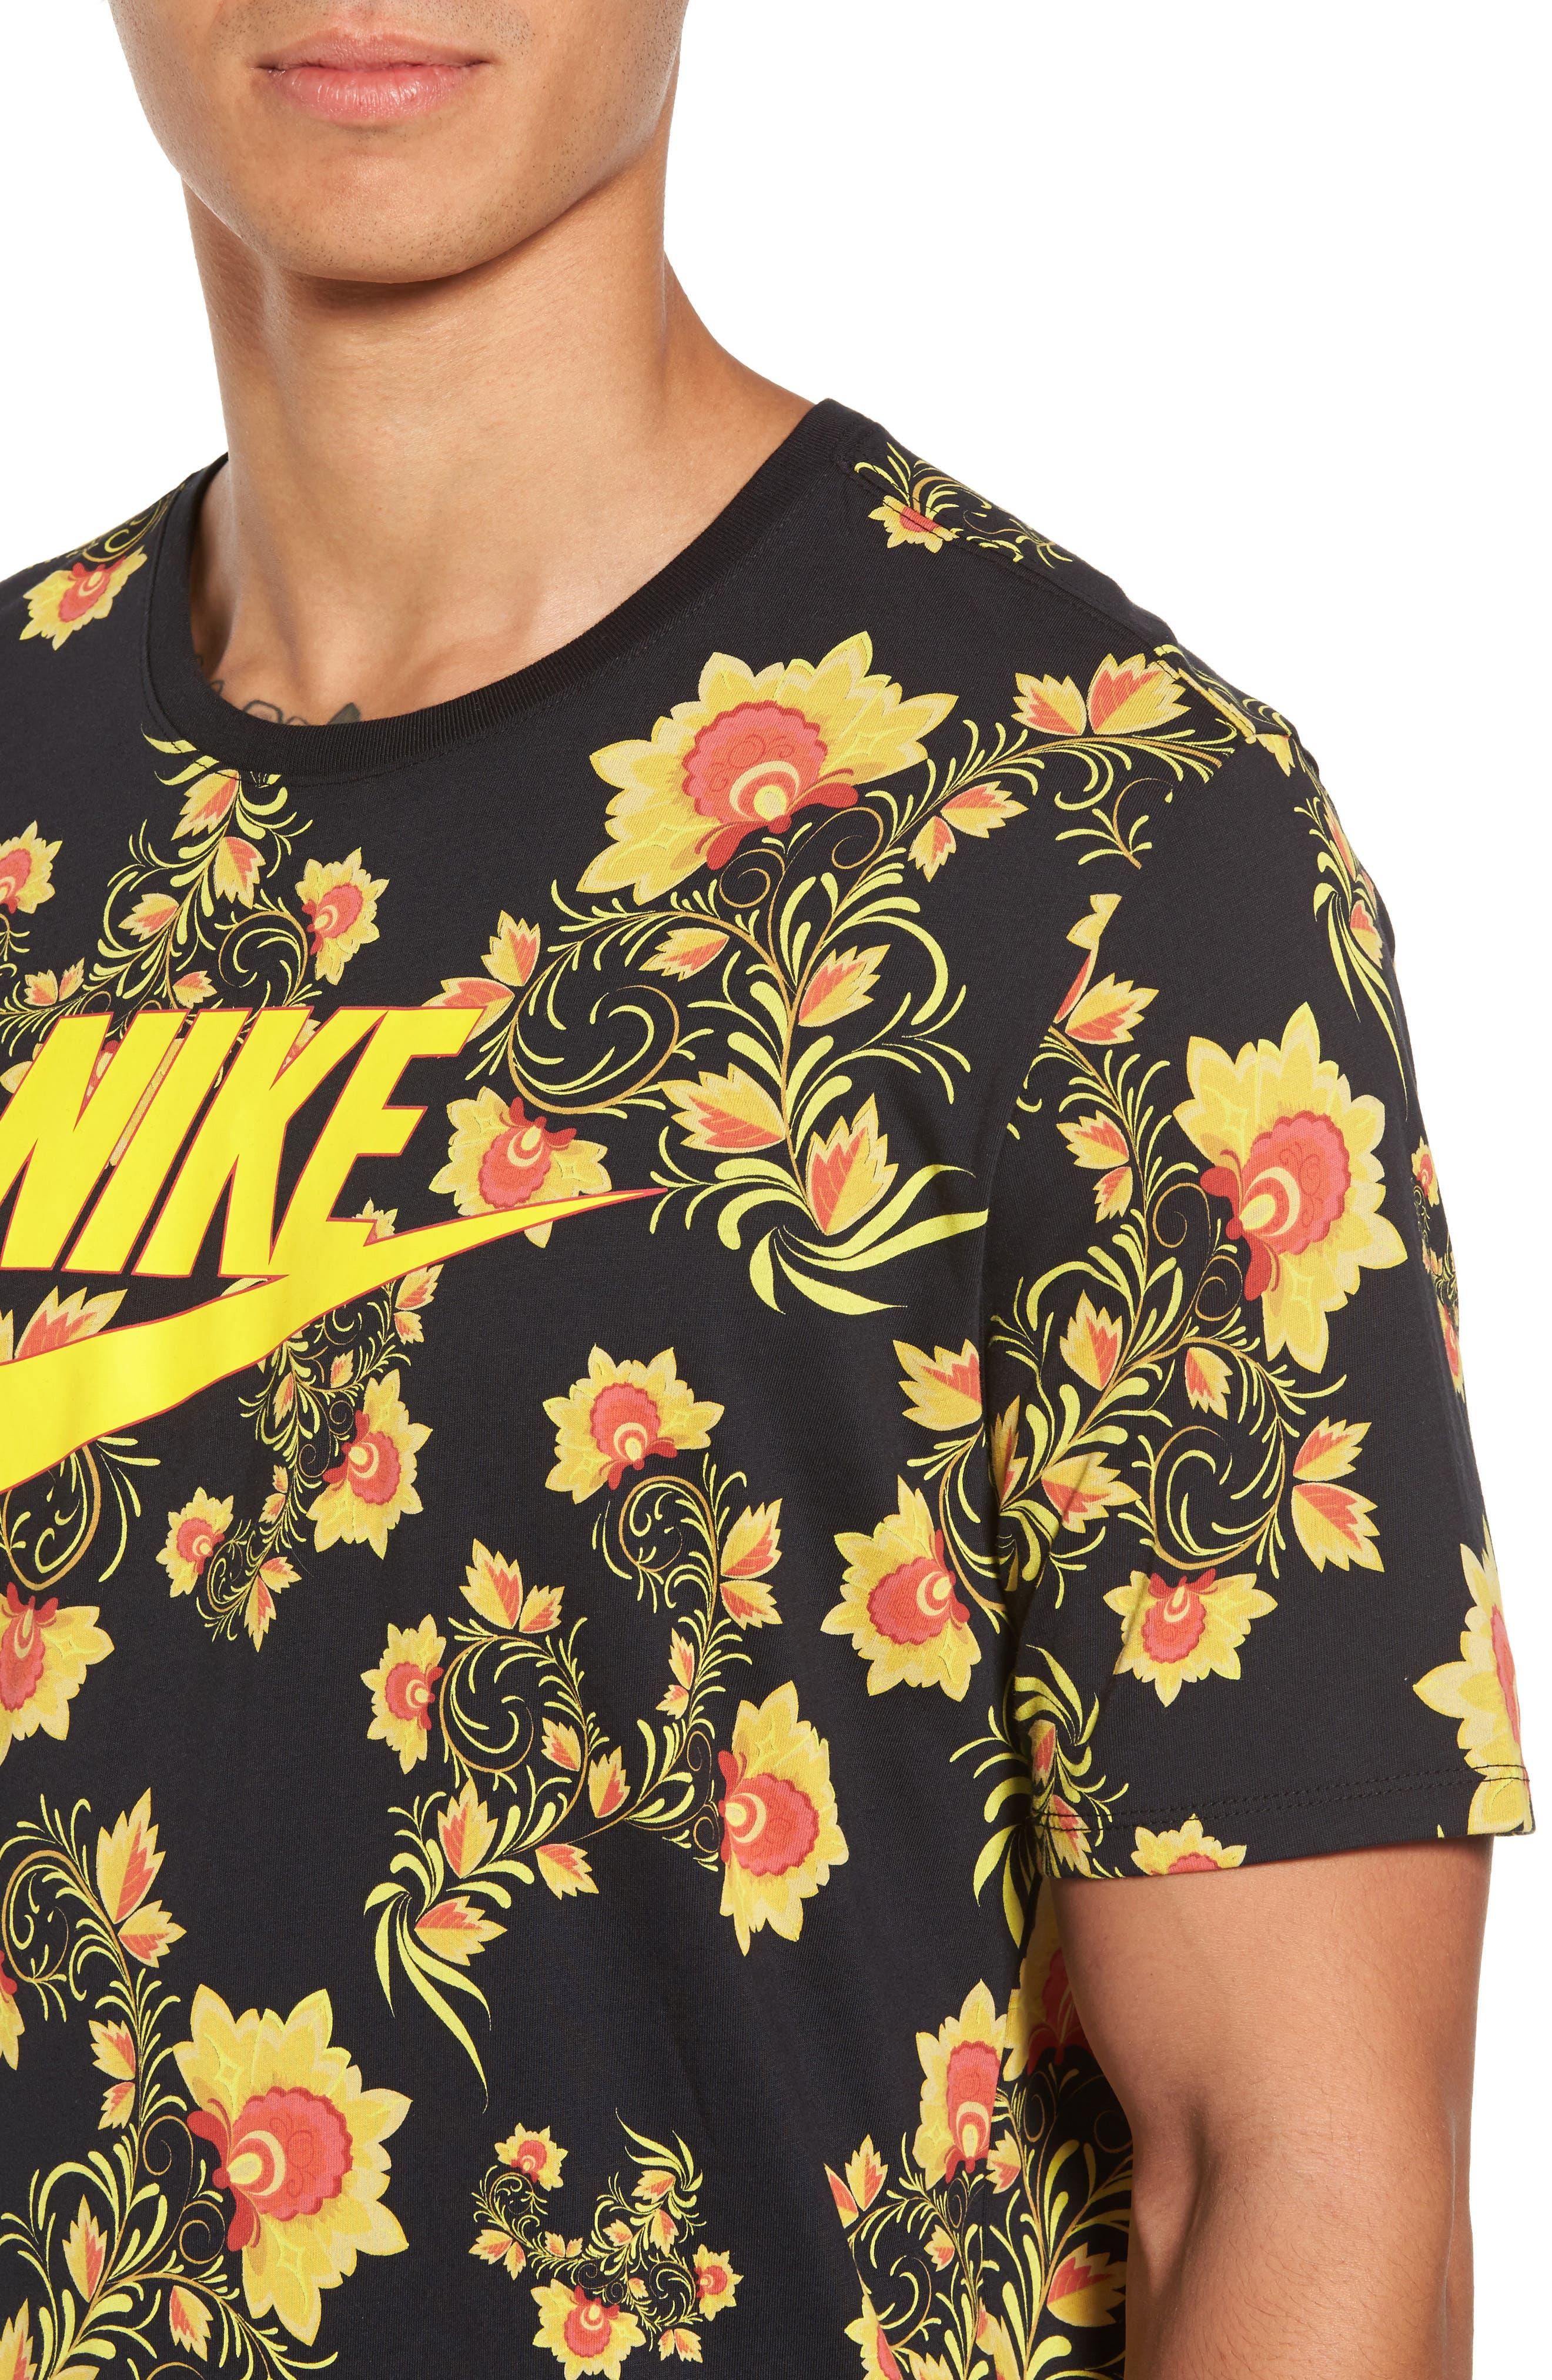 NSW Concept T-Shirt,                             Alternate thumbnail 4, color,                             Black/ Tour Yellow